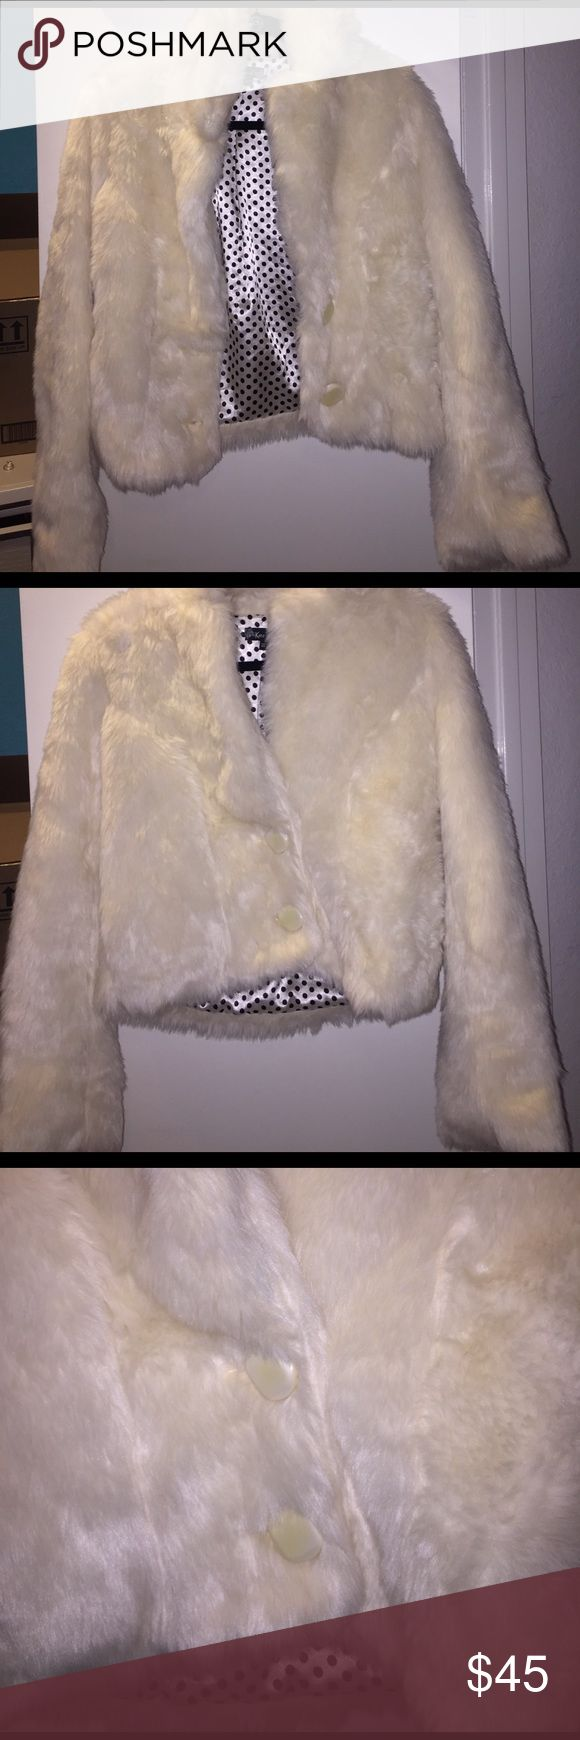 White faux fur jacket White faux fur jacket with black and white polka for silk inside Ketz-ke Jackets & Coats